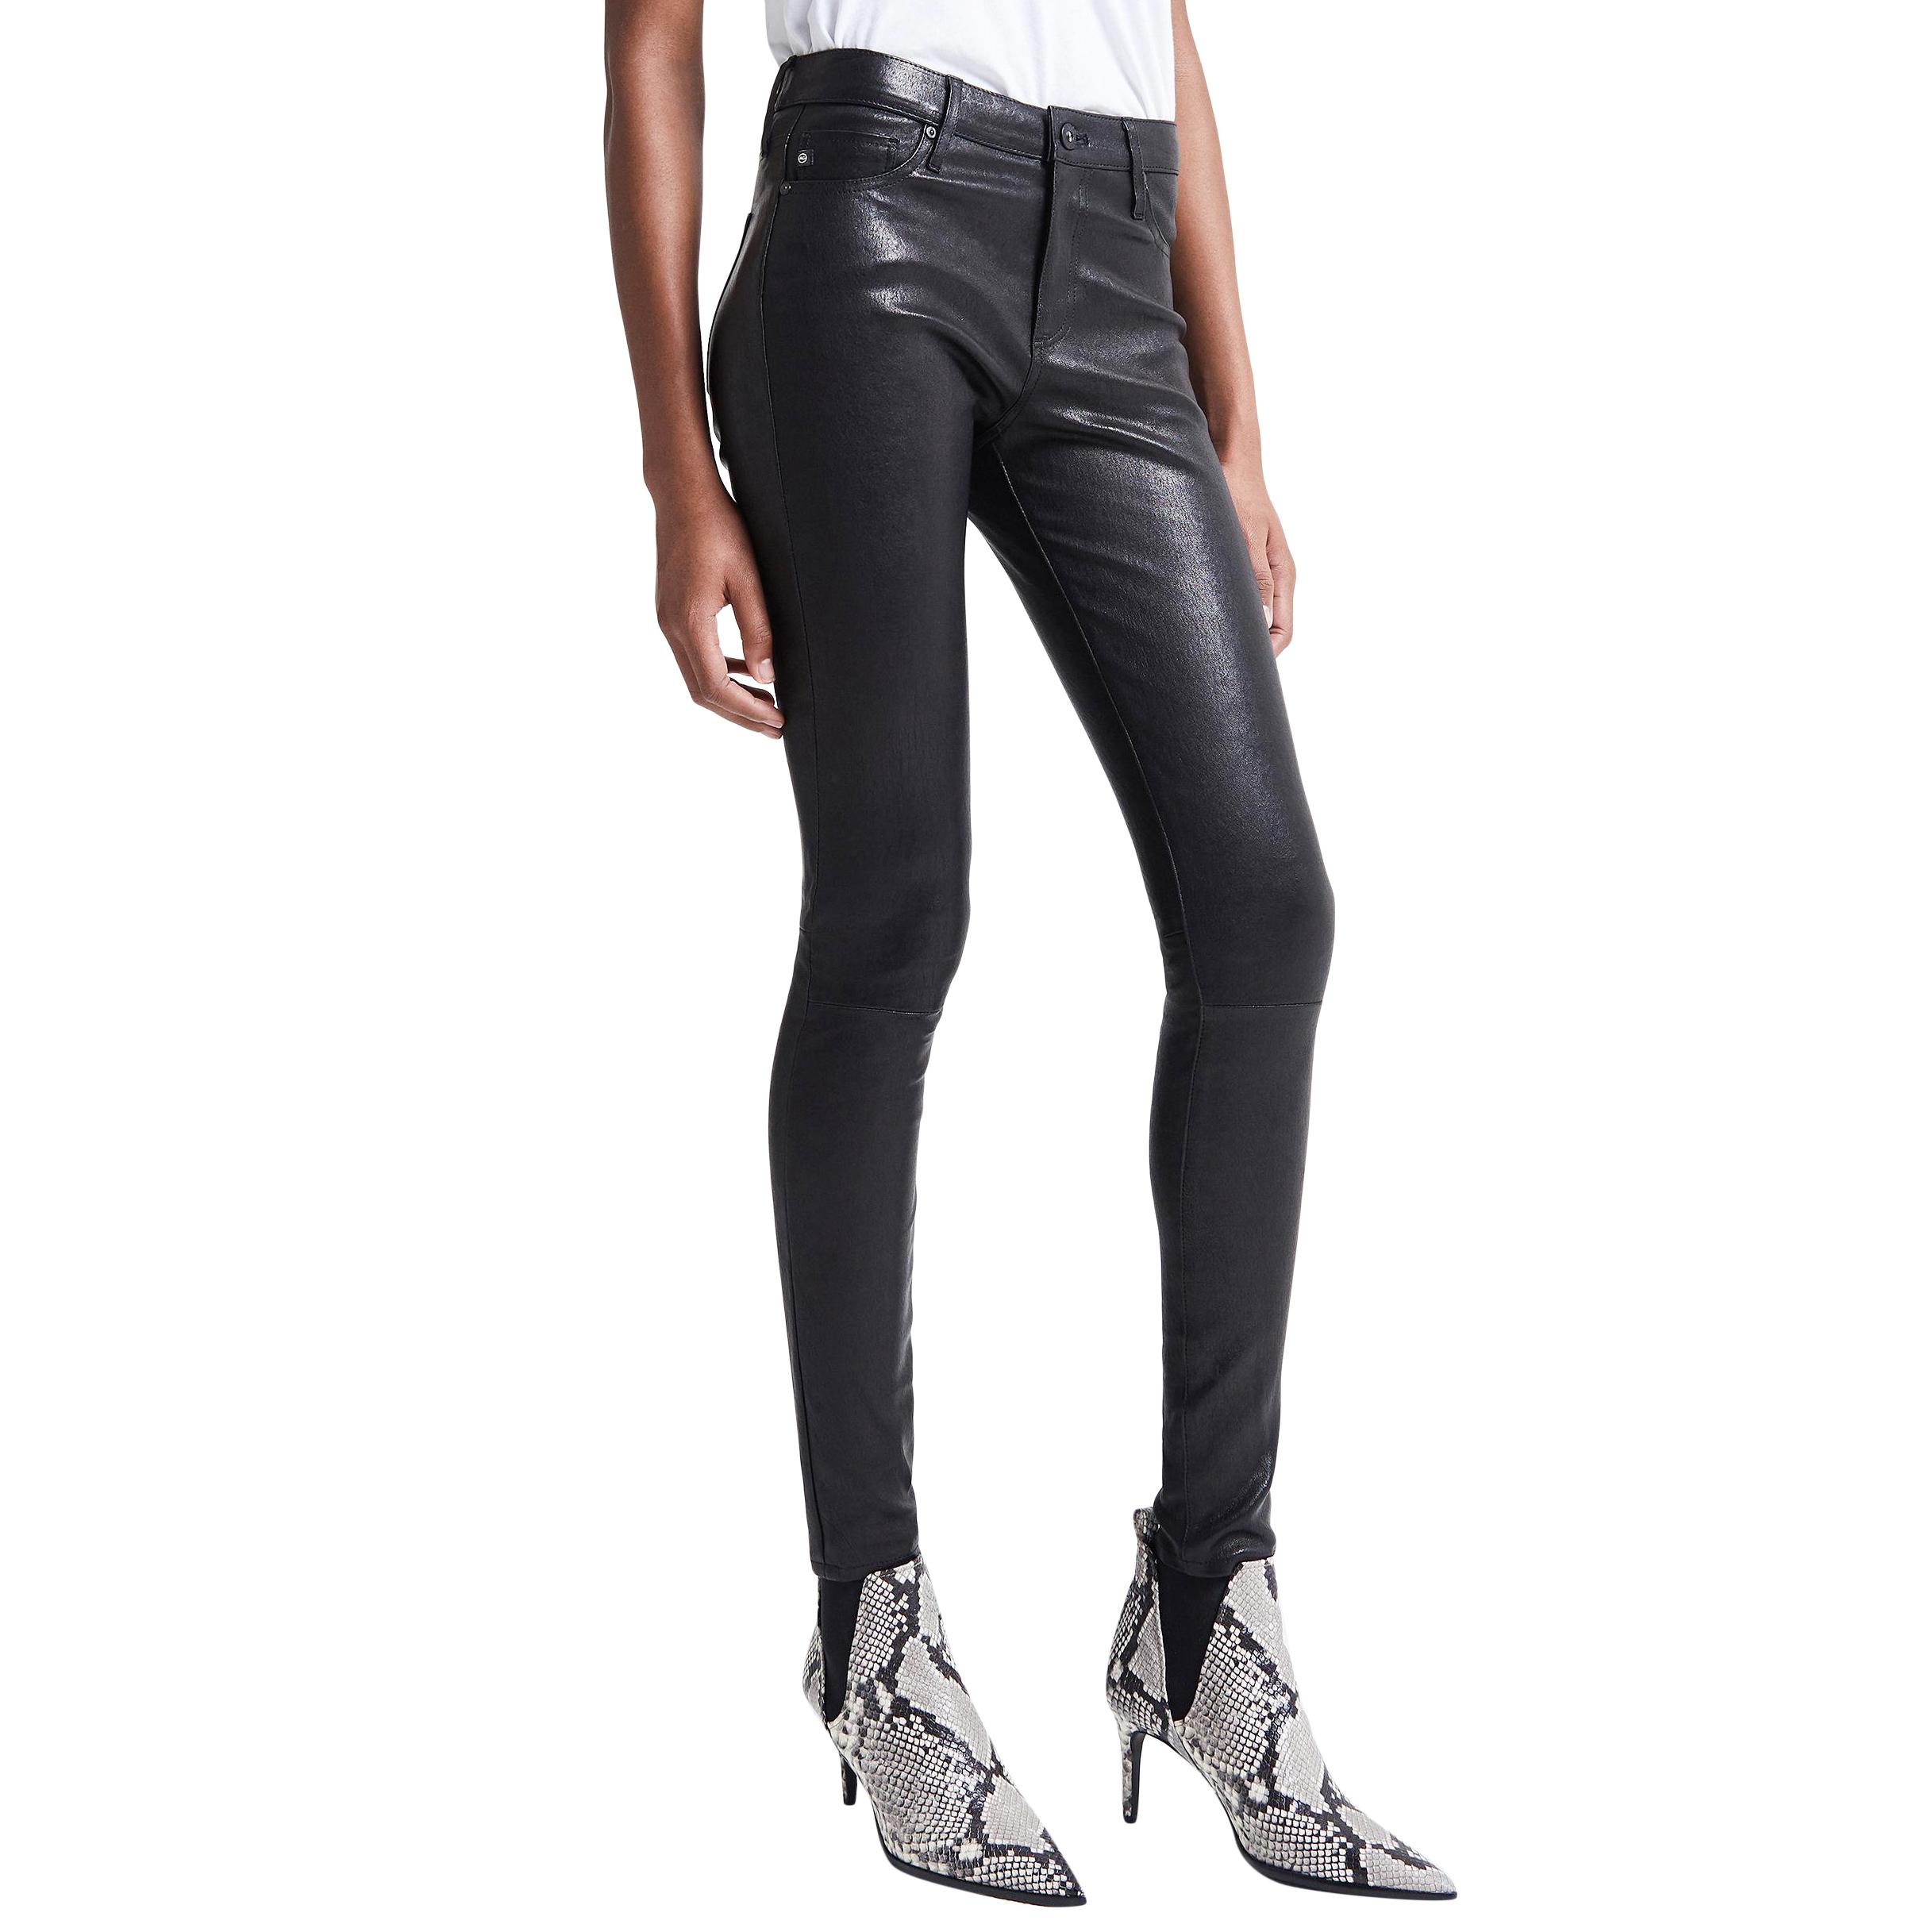 AG Jeans The Leather Legging in Super Black Skinny Jeans